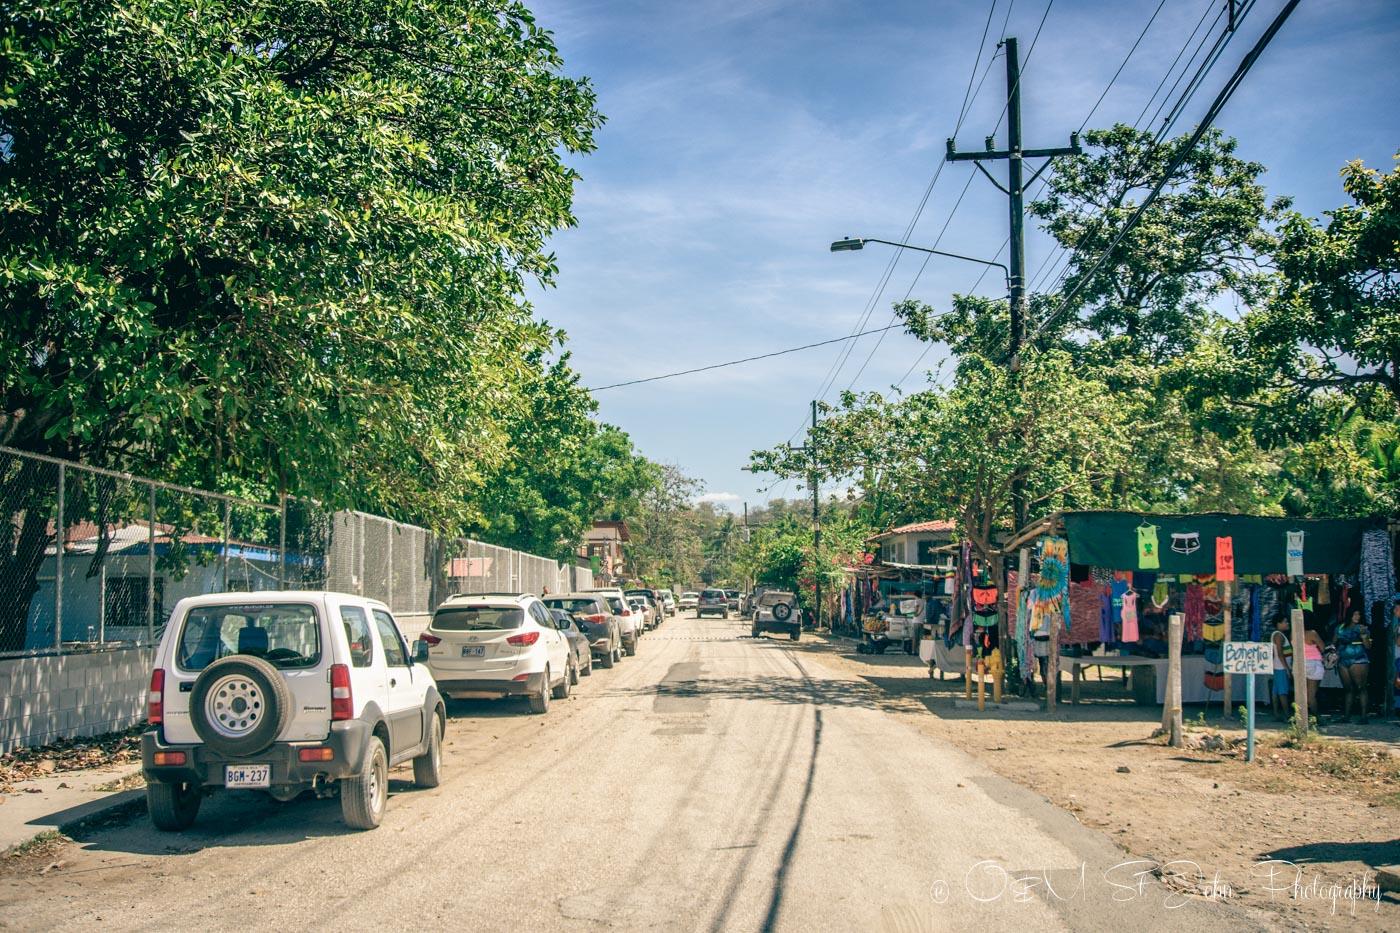 Samara Costa Rica: Street in Sámara, Guanacaste. Costa Rica